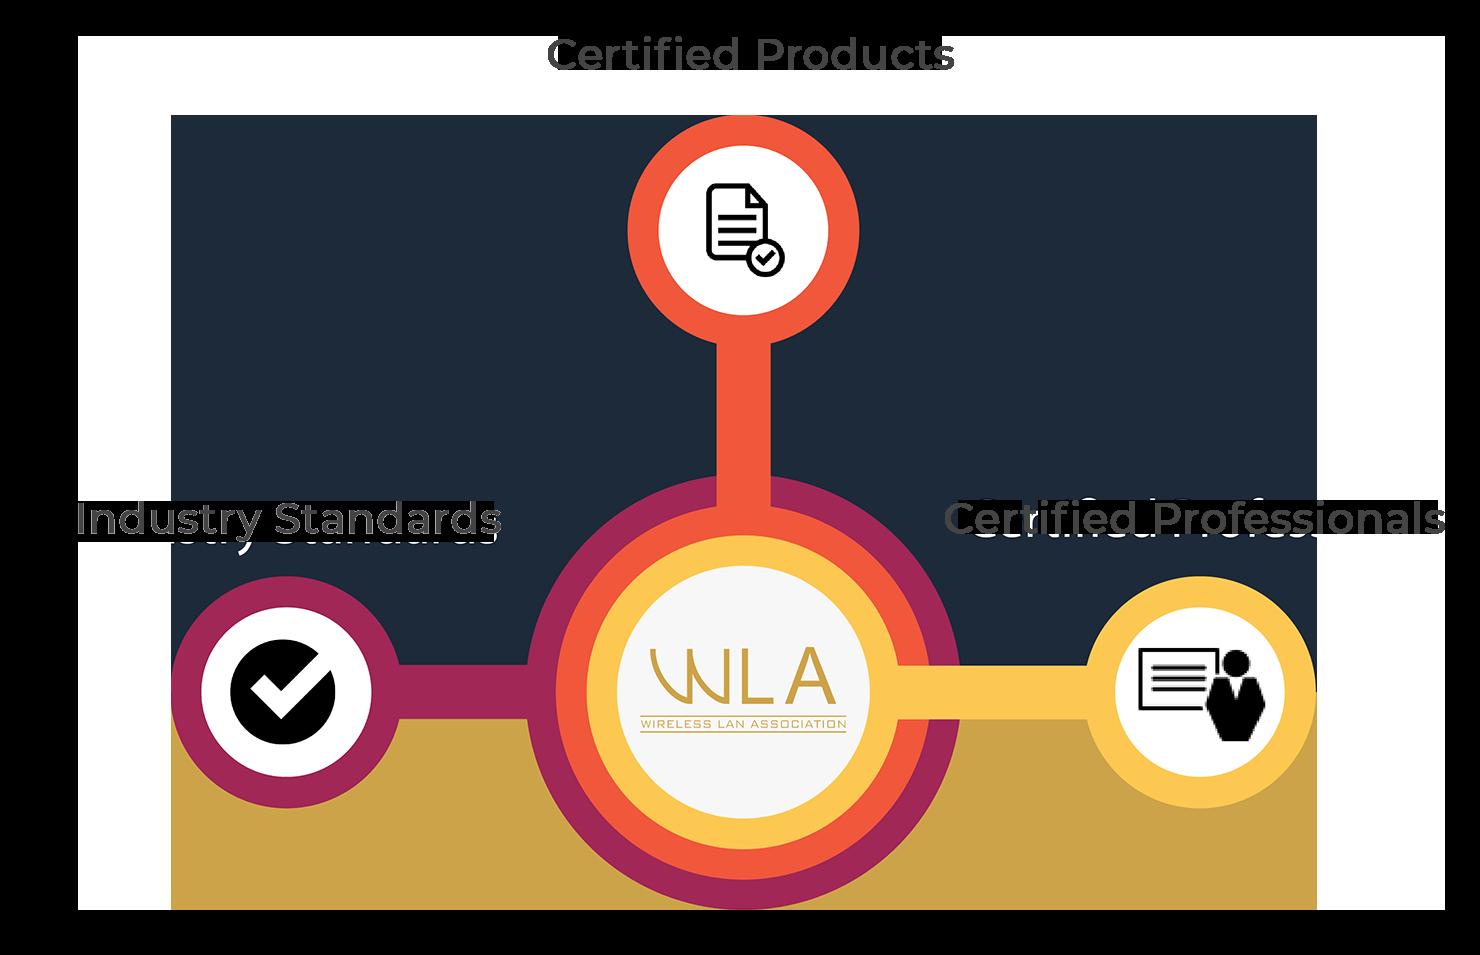 Wireless Lan Association - infographic